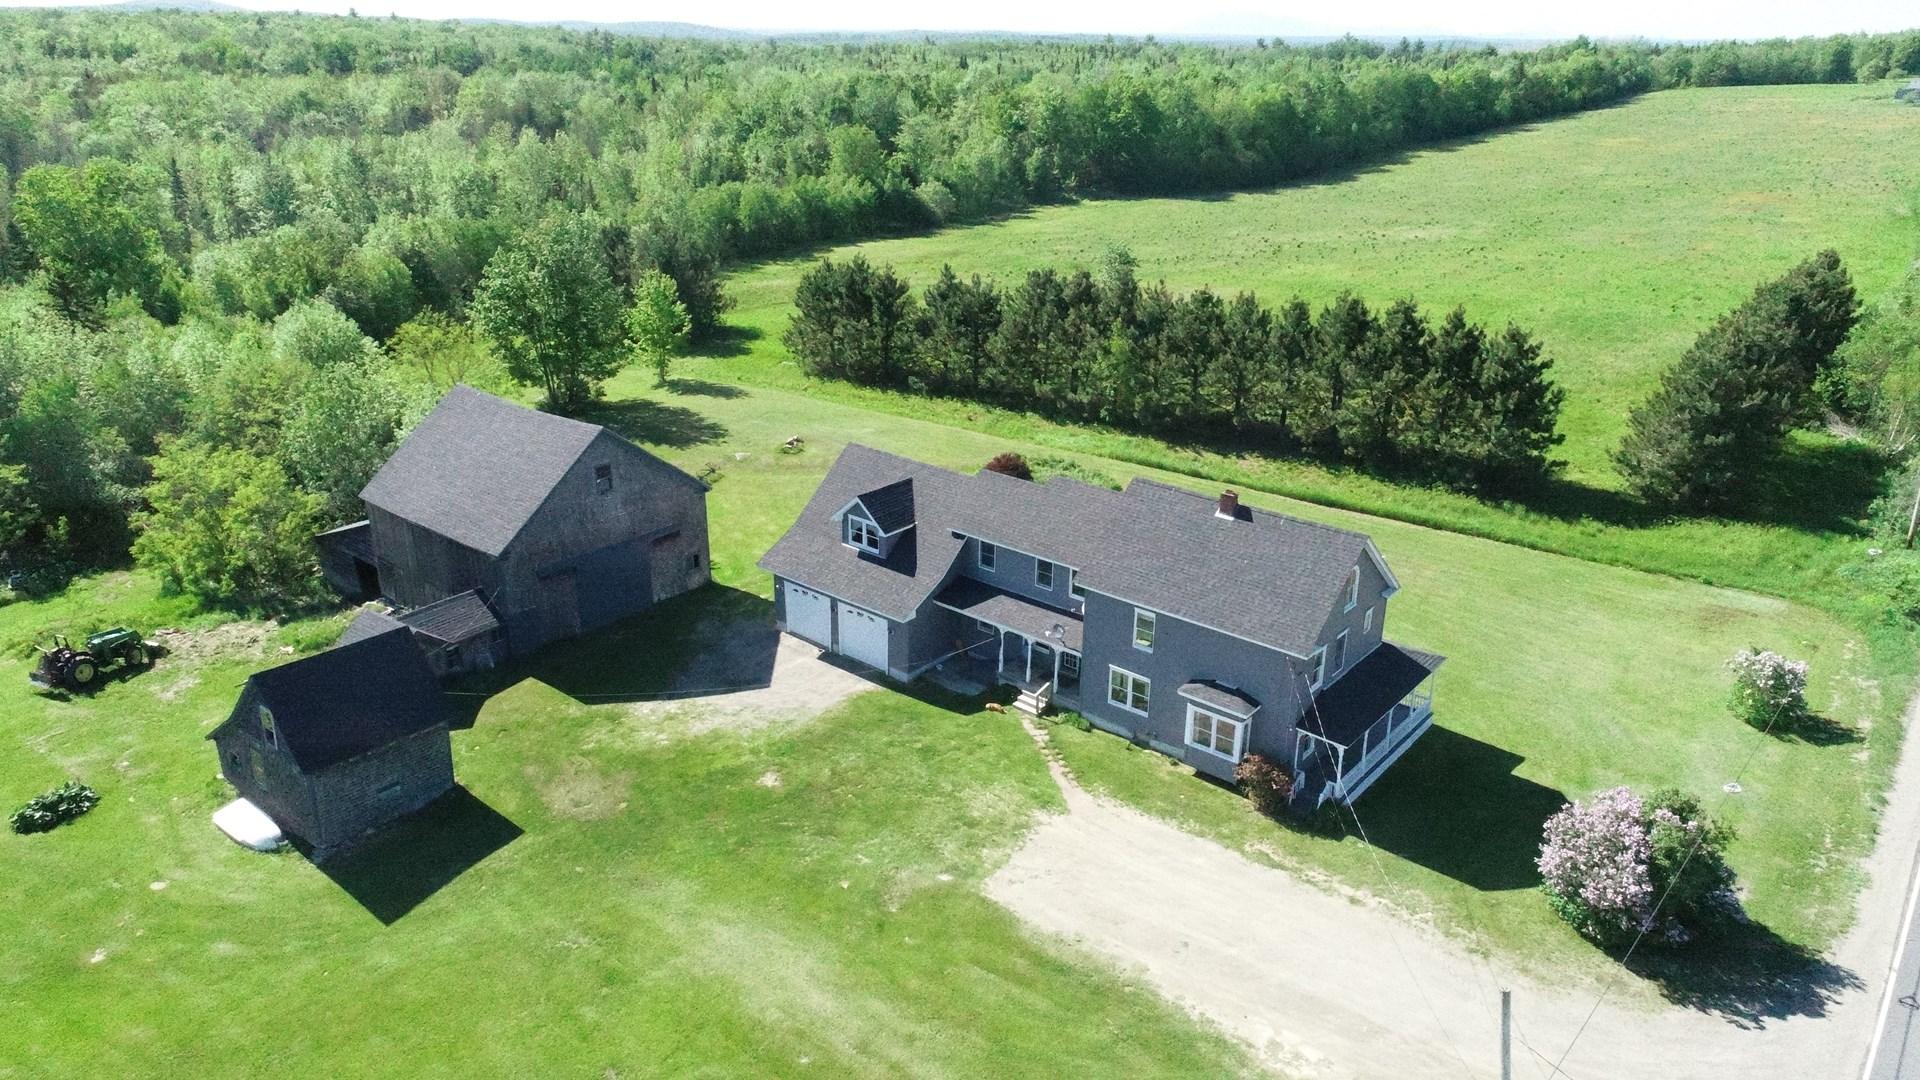 Maine Farmhouse for sale with acreage